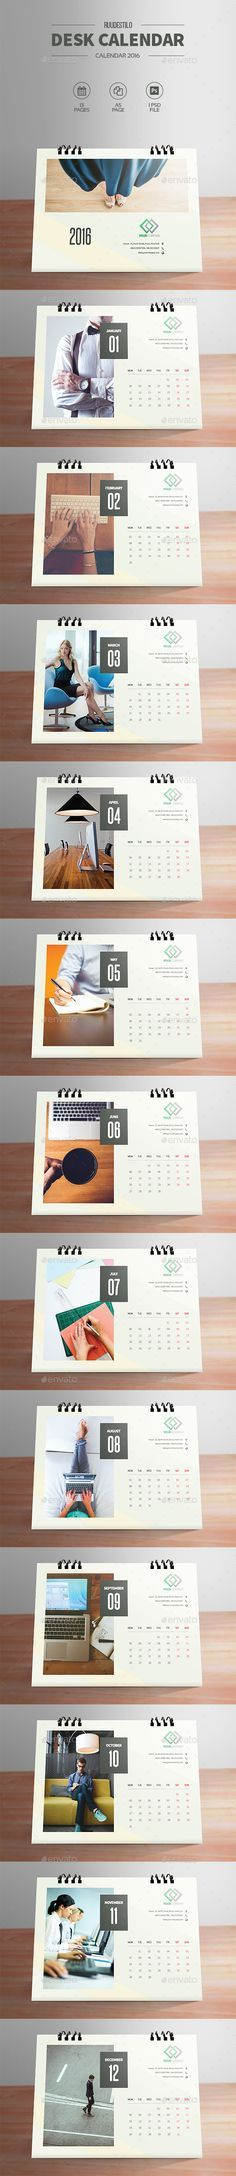 Clean Desktop Calendar 2016 Template PSD #design Download: http://graphicriver.net/item/clean-desktop-calendar-2016/13971717?ref=ksioks